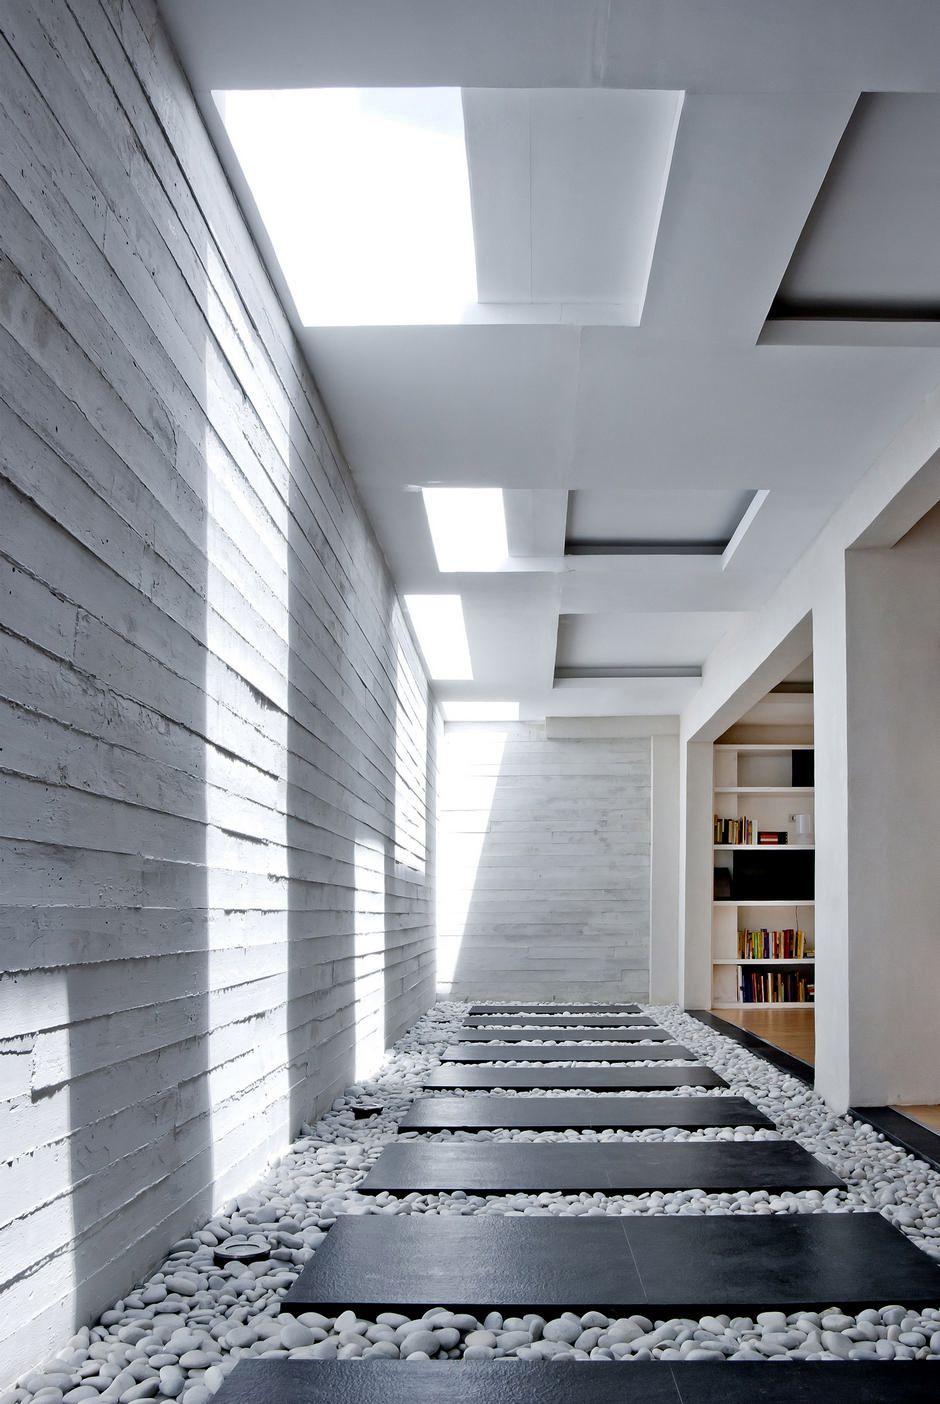 Courtyard-House-03